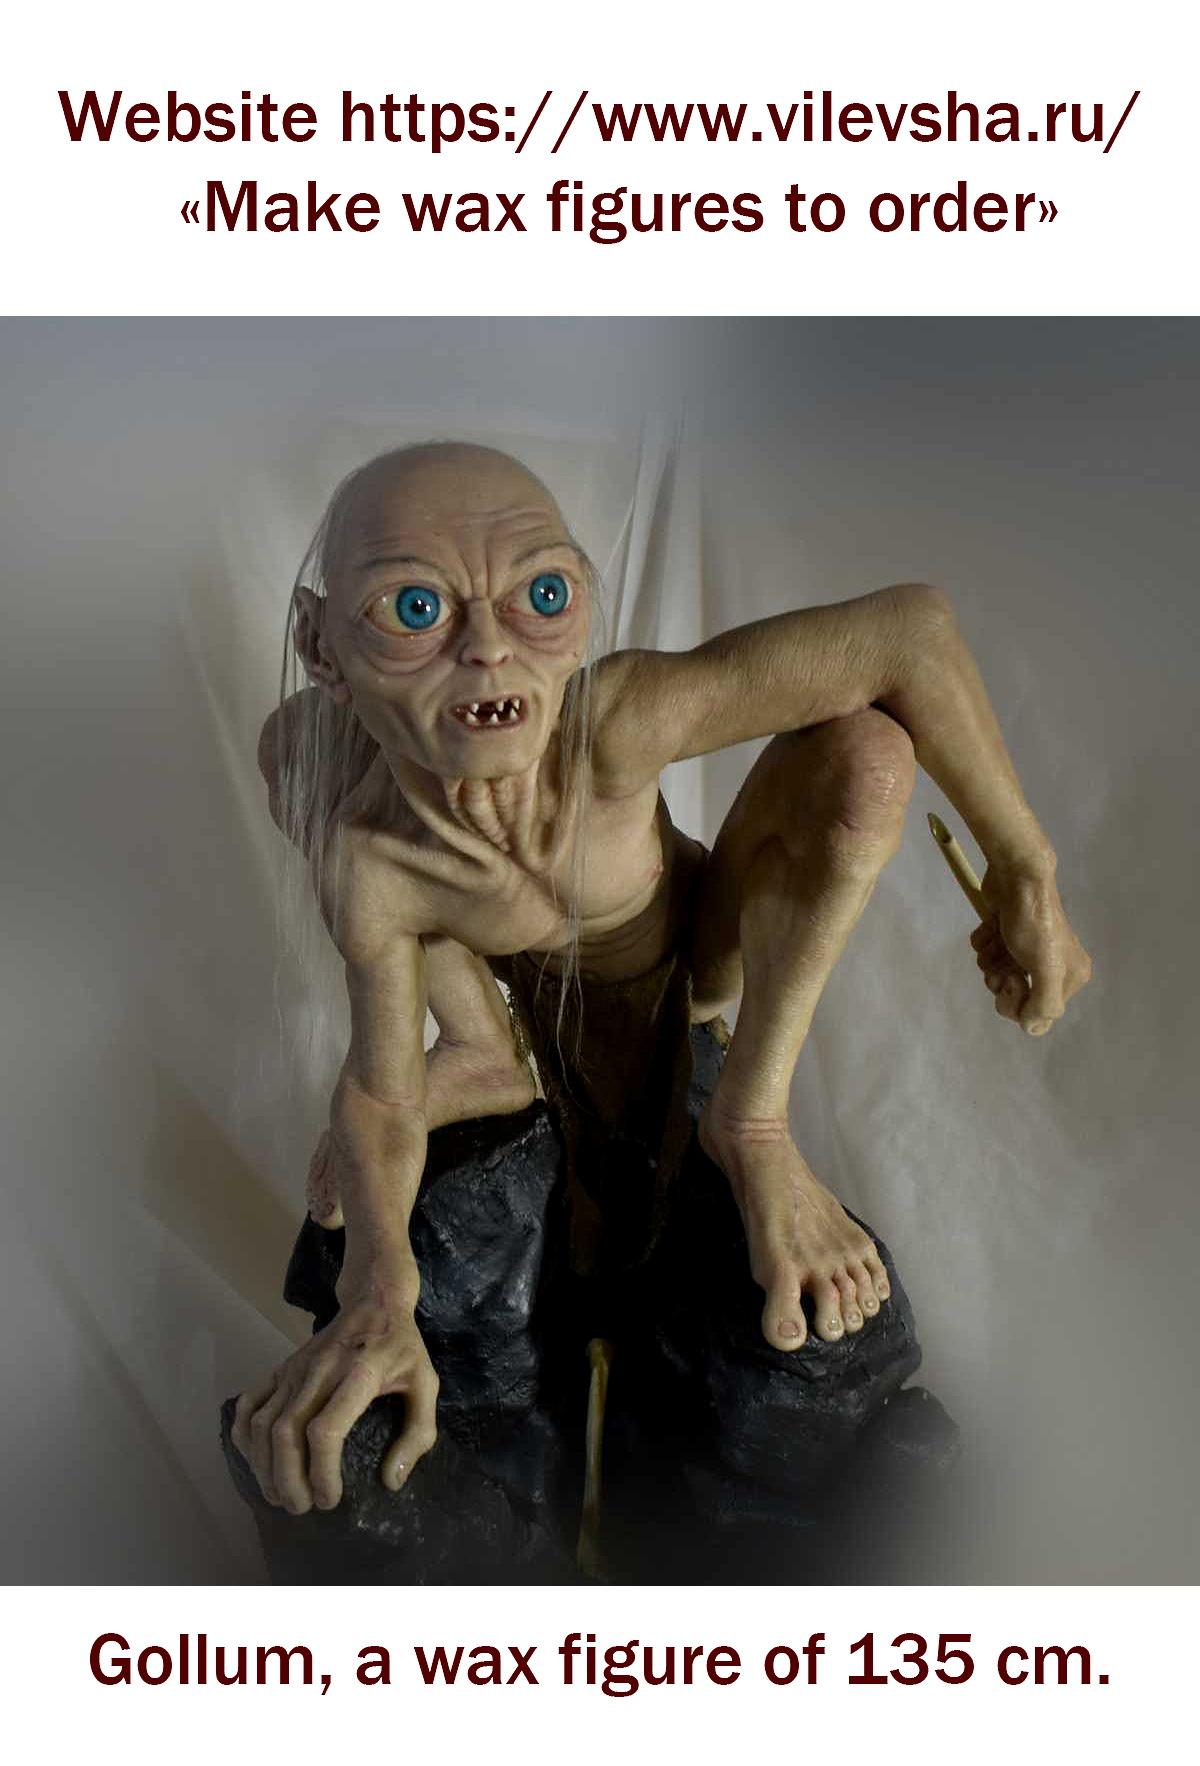 The wax figure of Gollum